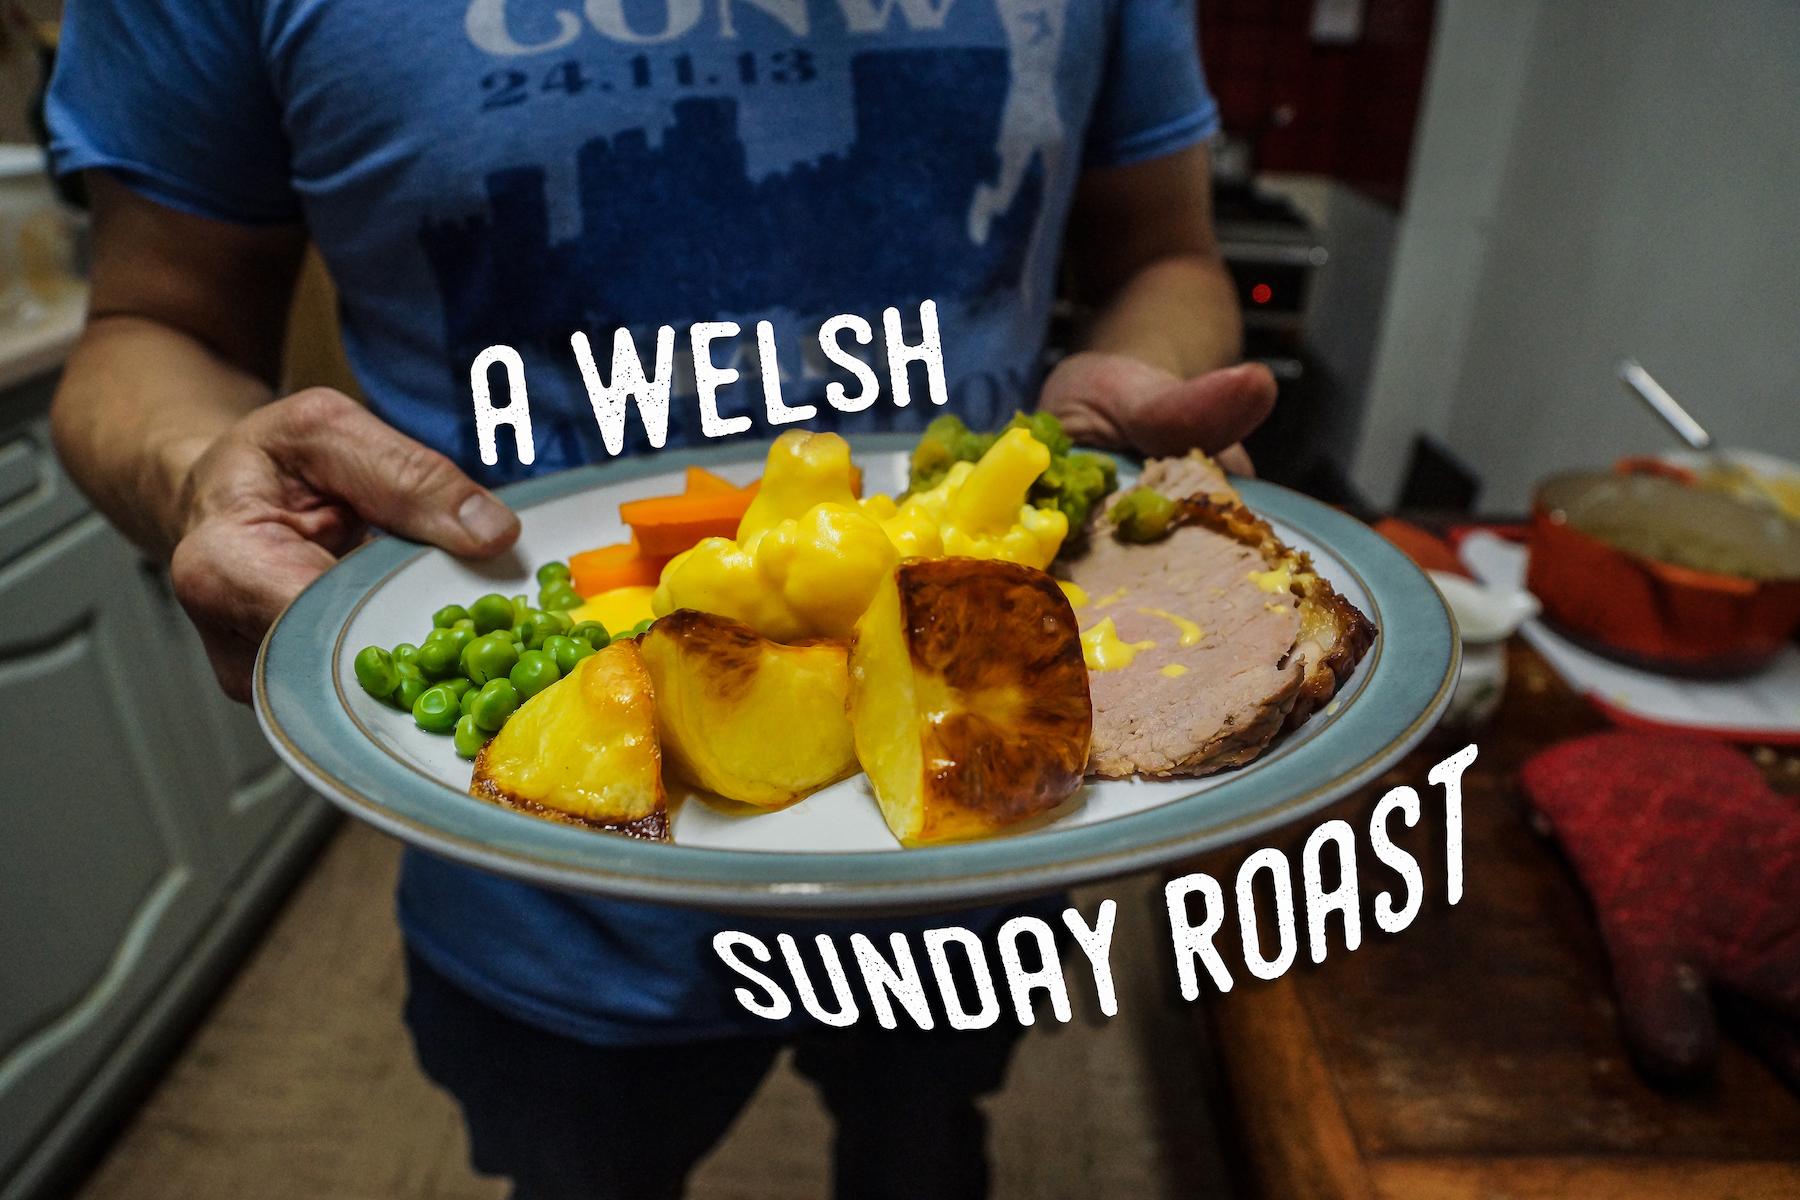 A Welsh Sunday Roast